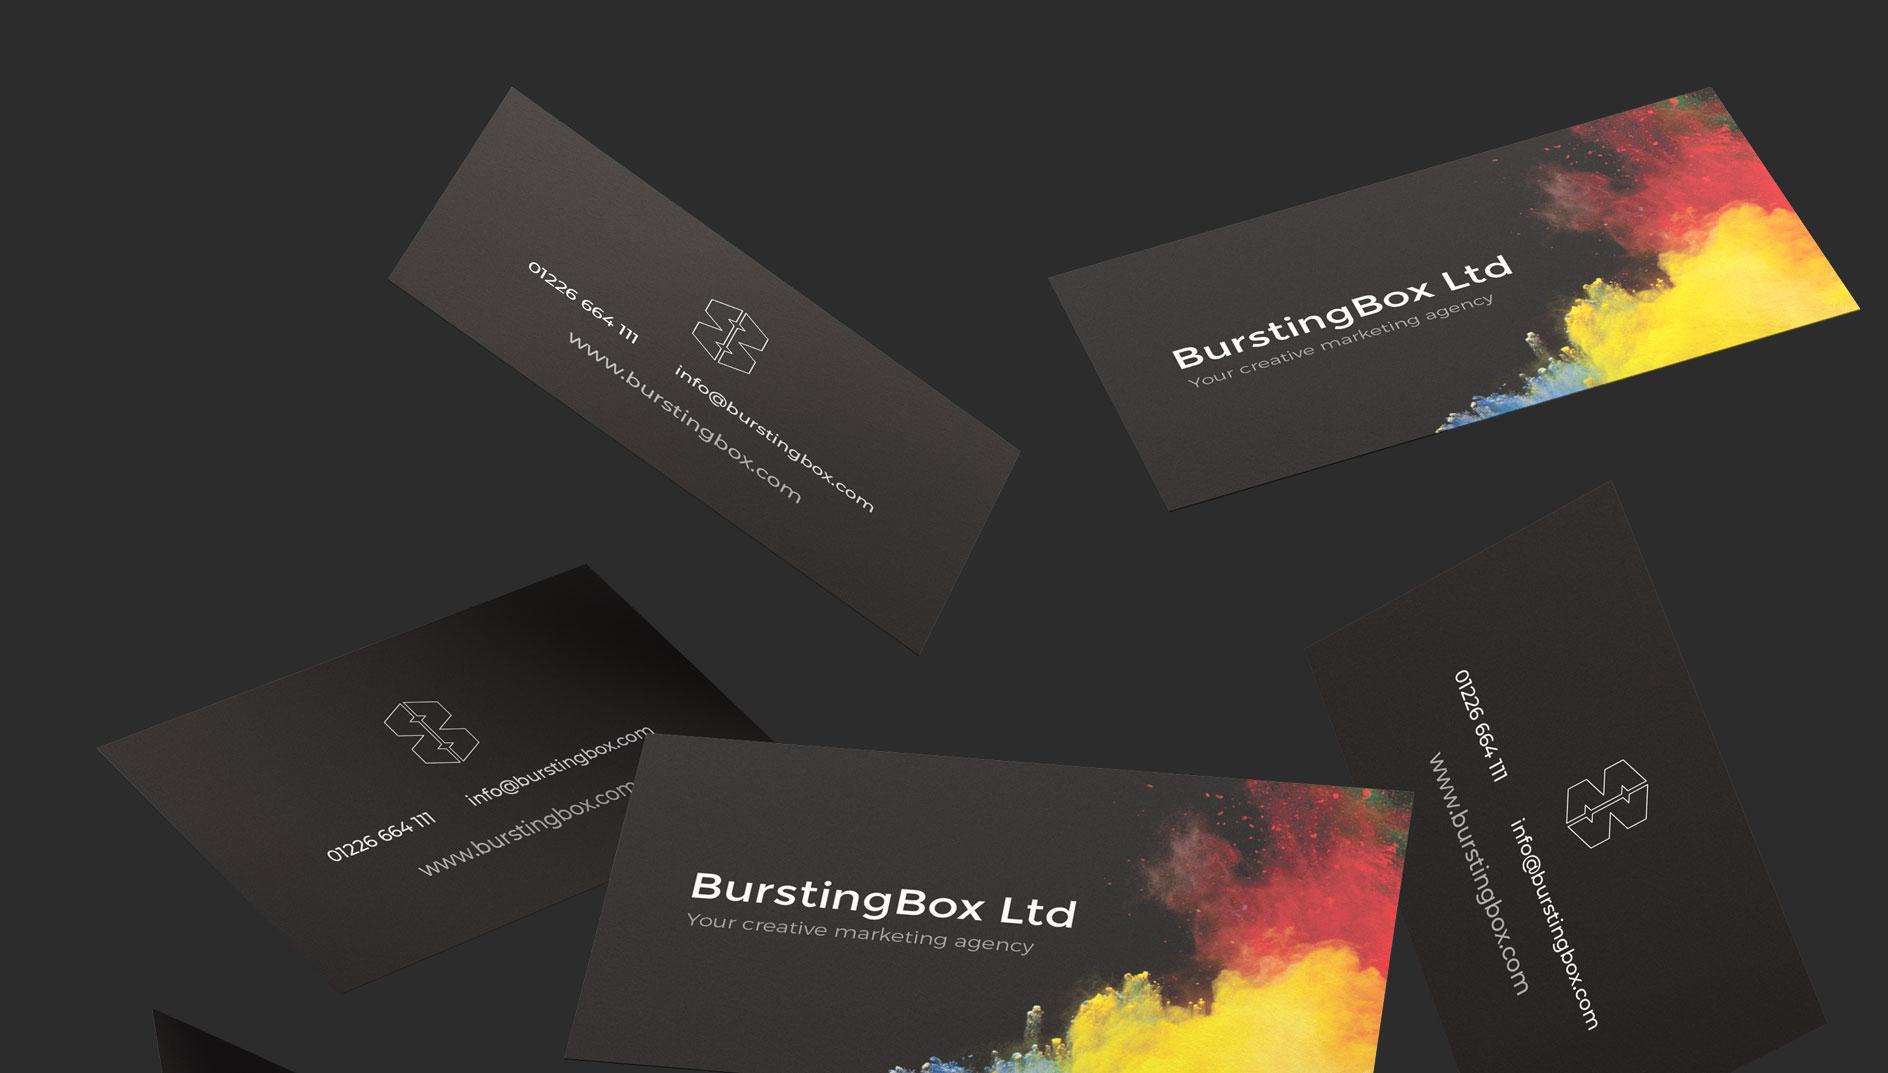 Contact BurstingBox